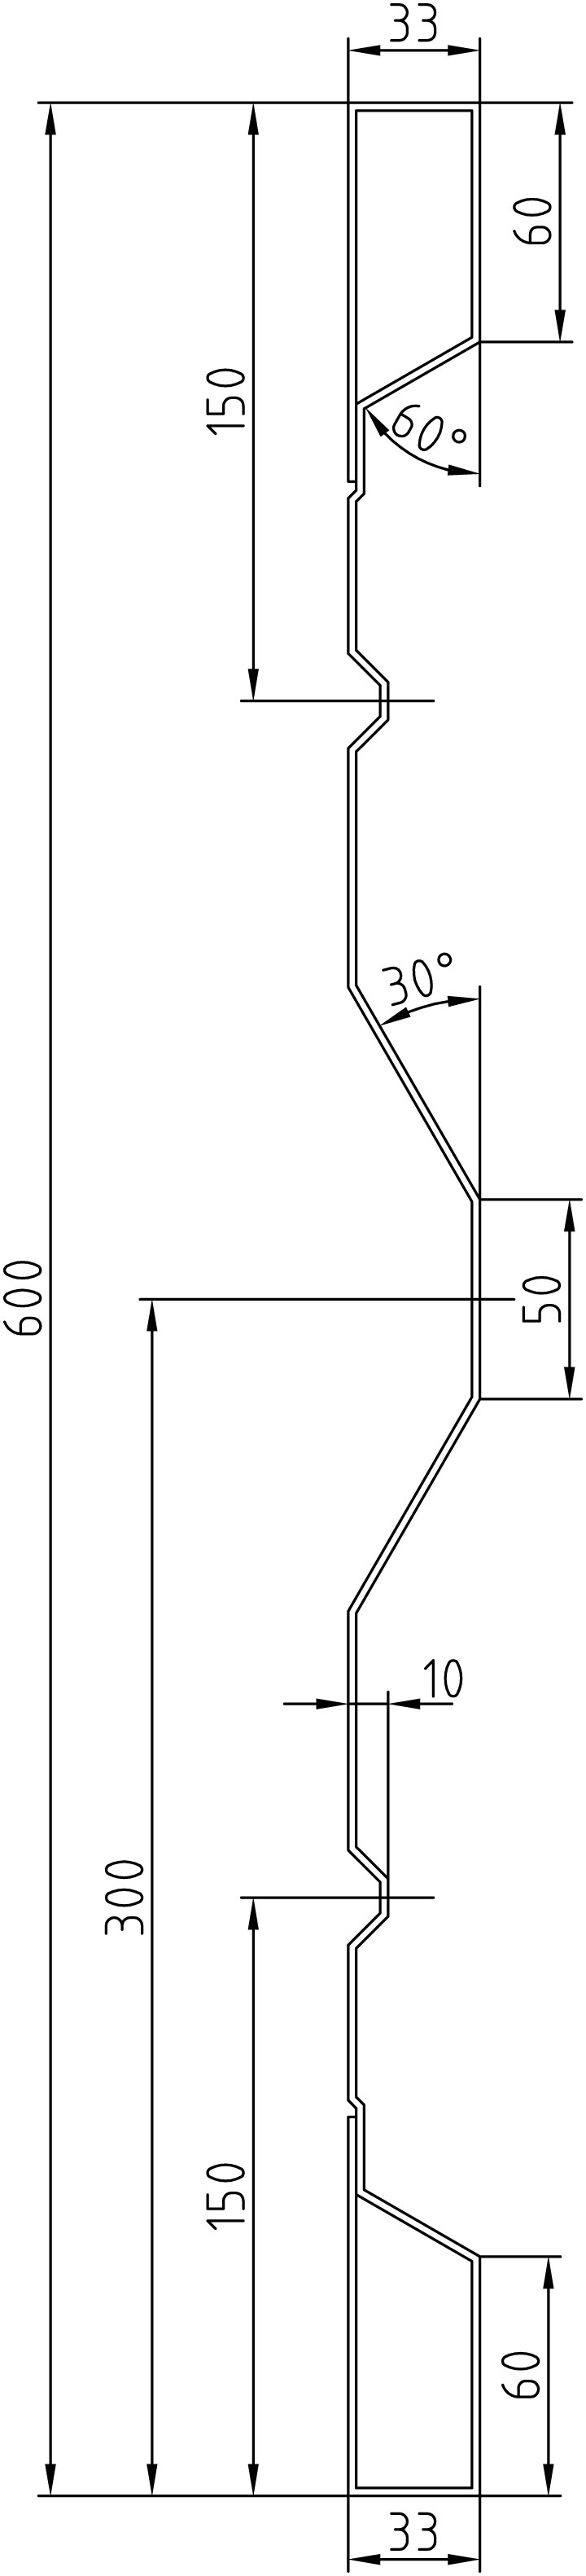 Brantner Kipper und Anhänger - SmE HV 600x2 2141 Winkel NP 40/20/5